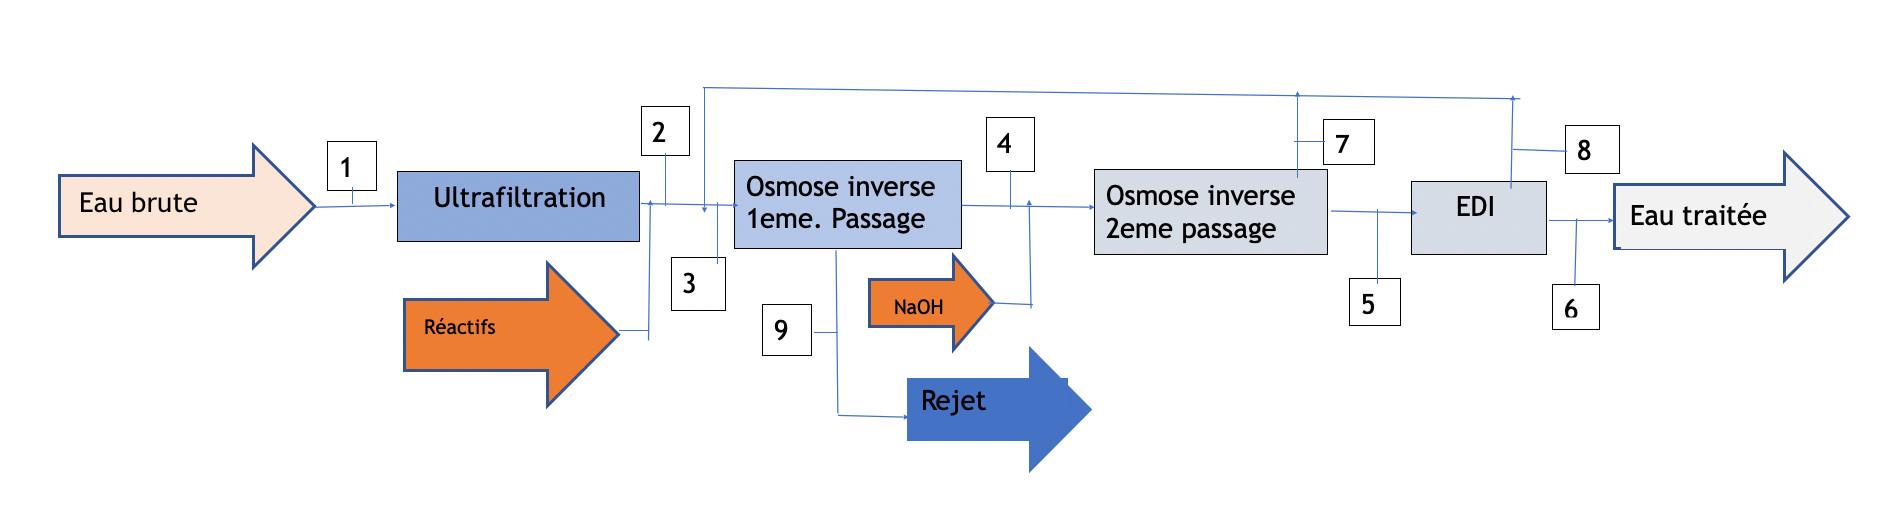 edi-diagram-1-fr